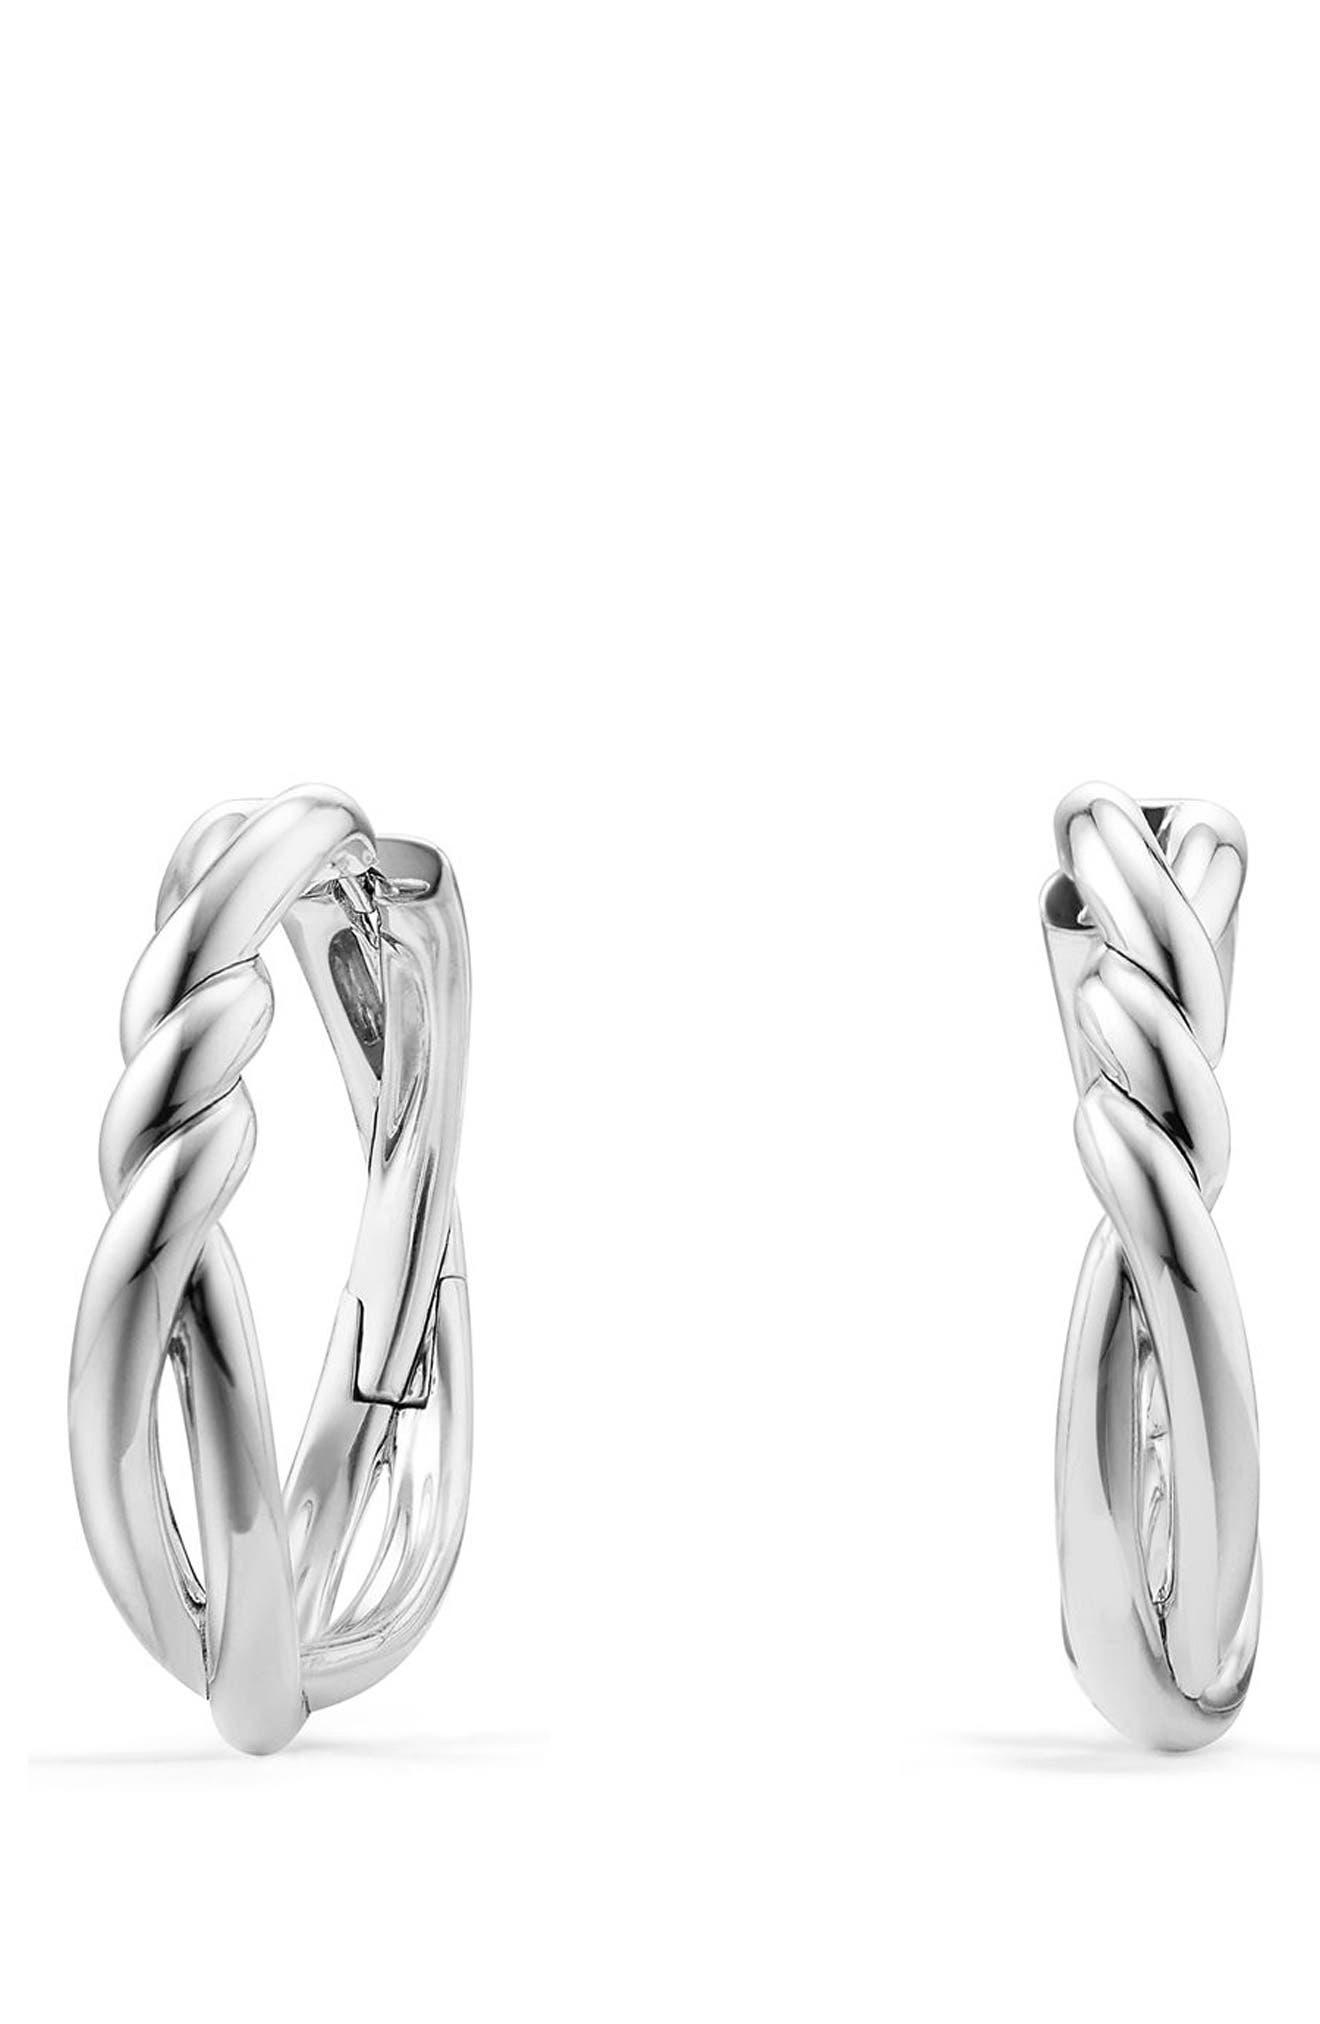 DAVID YURMAN Continuance Hoop Earrings, Main, color, SILVER